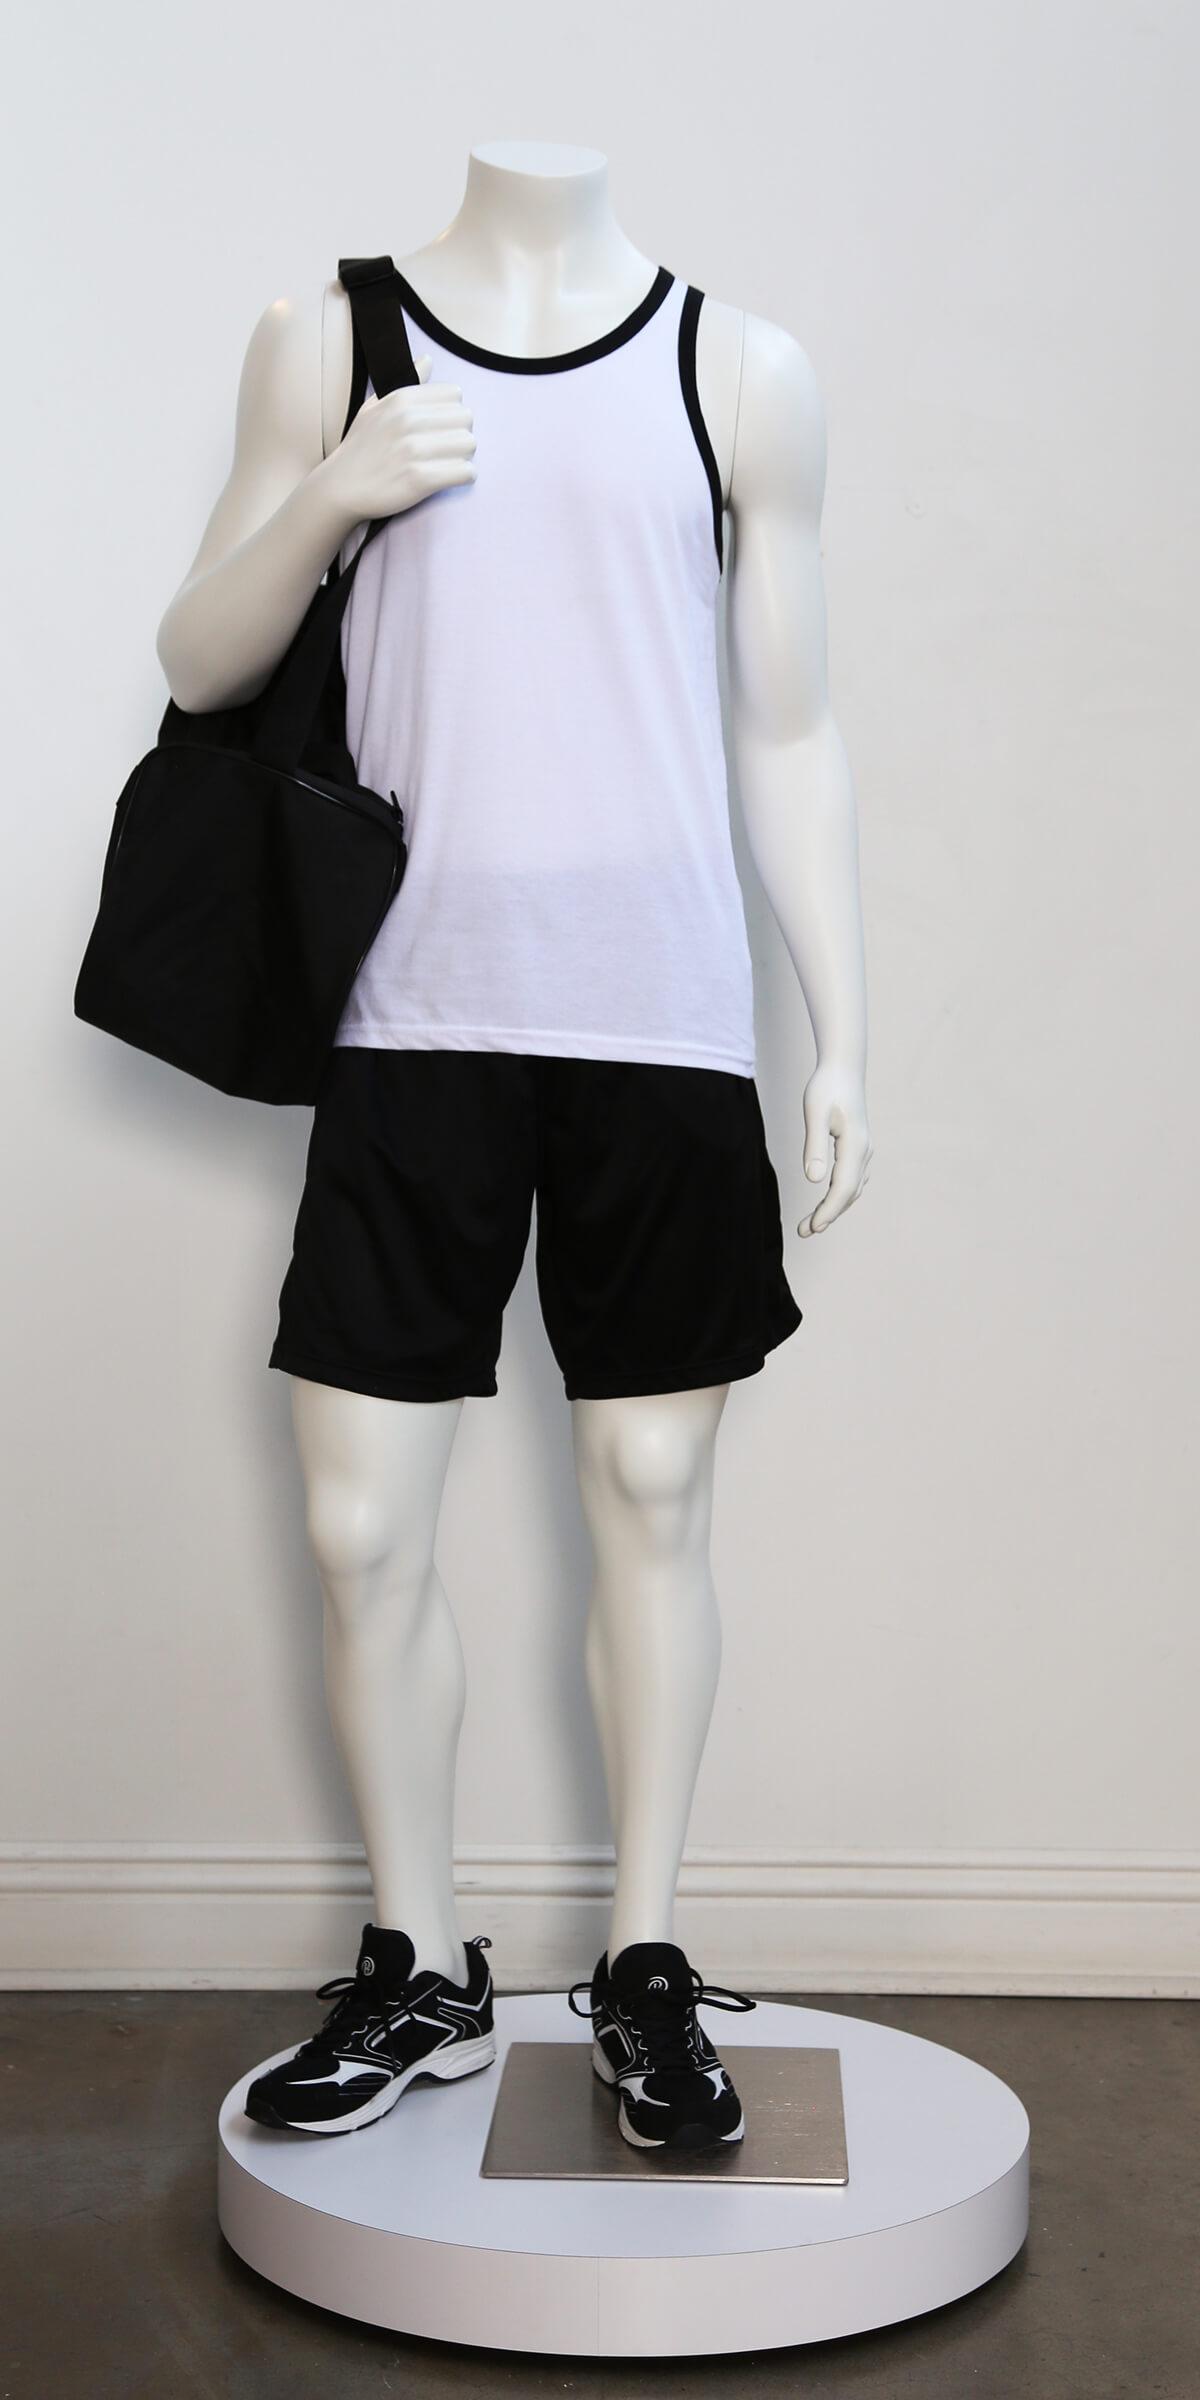 FIT2-M1A-Dressed